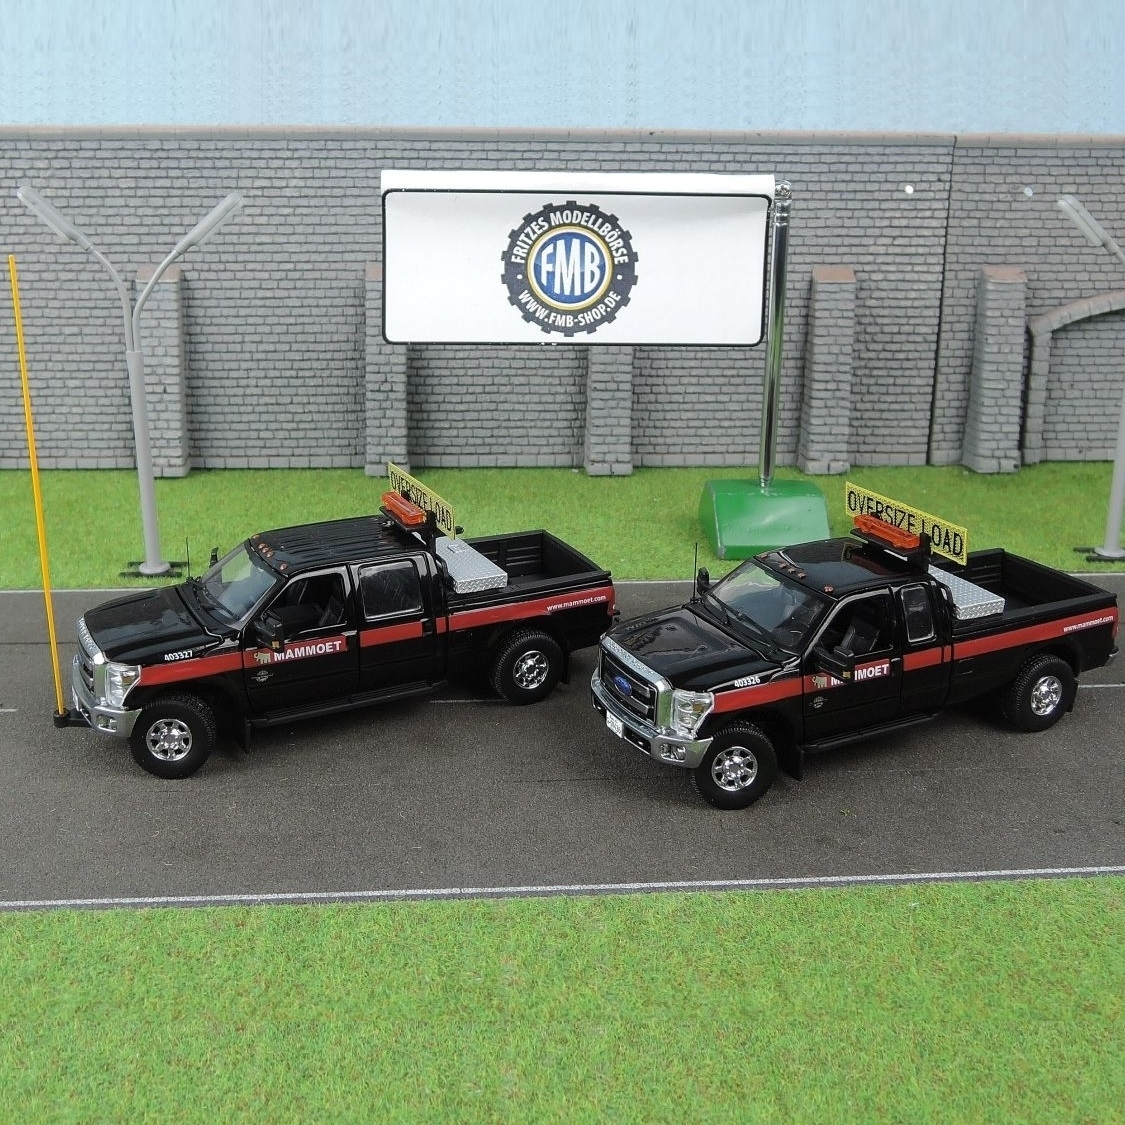 Ford F-250 Pickup 4 Door 1:50 Scale Die-Cast Model Car New in Box Sword Models